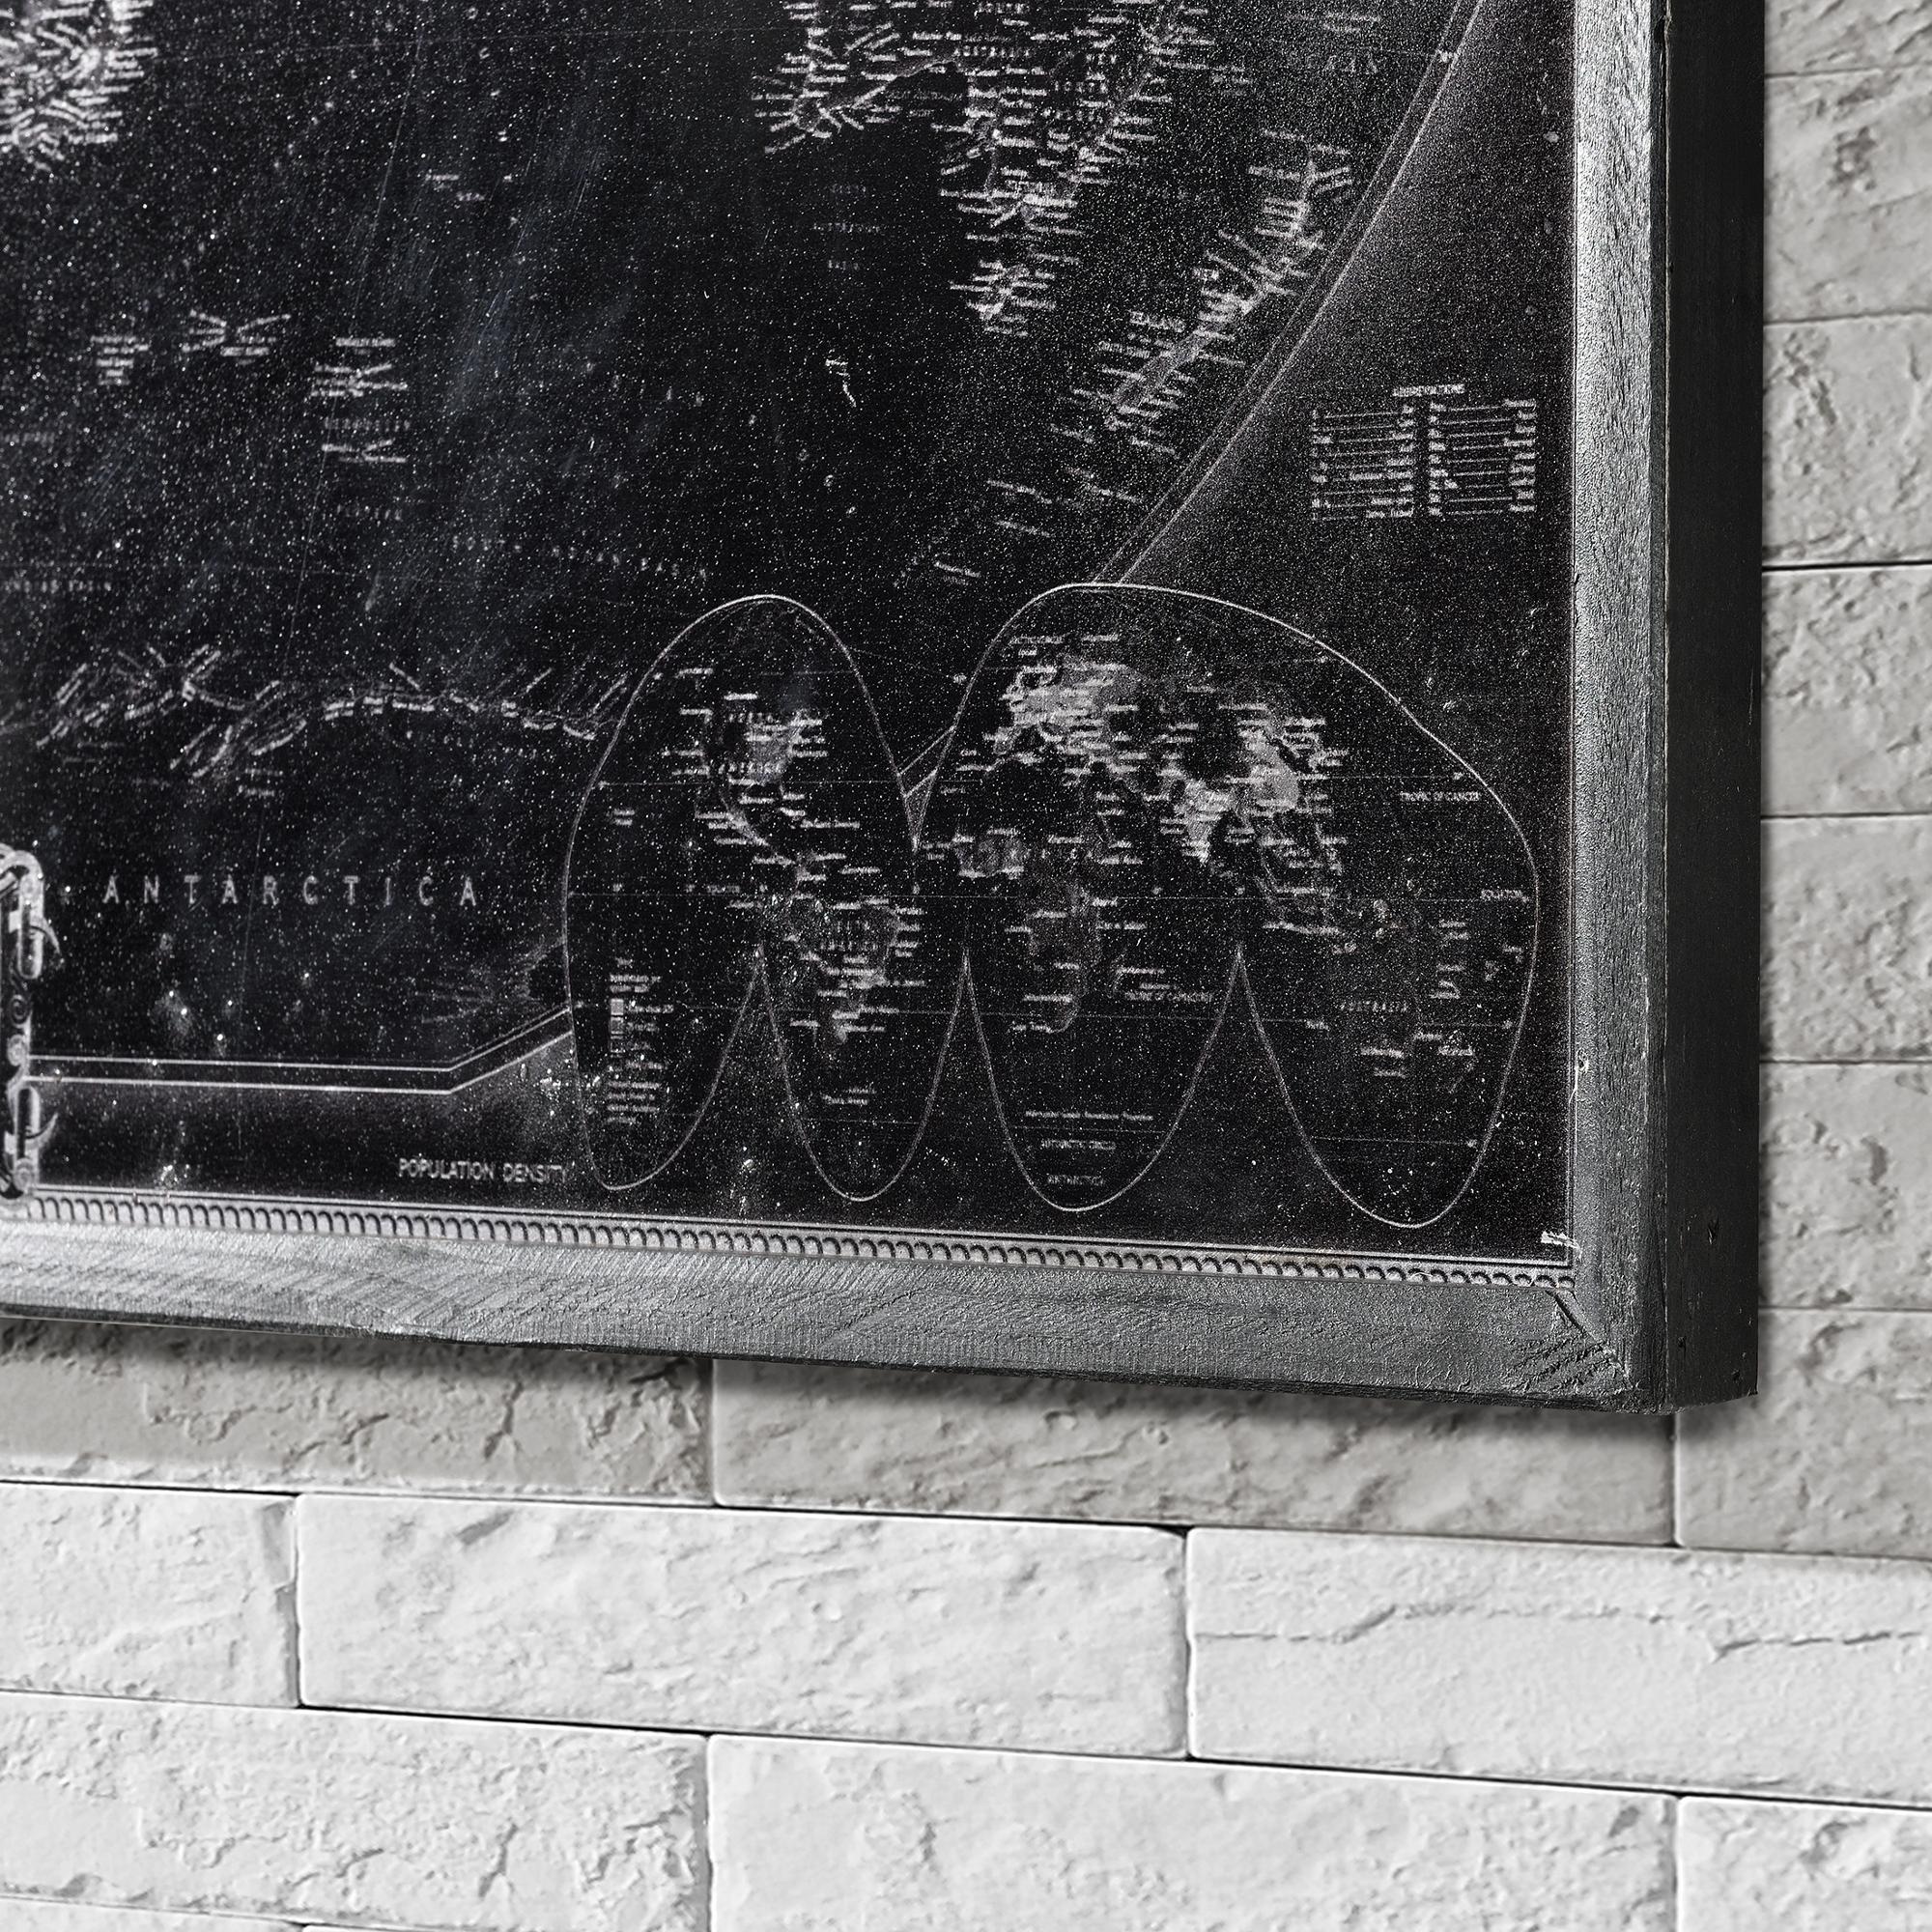 art work alu wandbild 80x60cm alte weltkarte globus erdkugel bild gerahmt eur 23 09. Black Bedroom Furniture Sets. Home Design Ideas